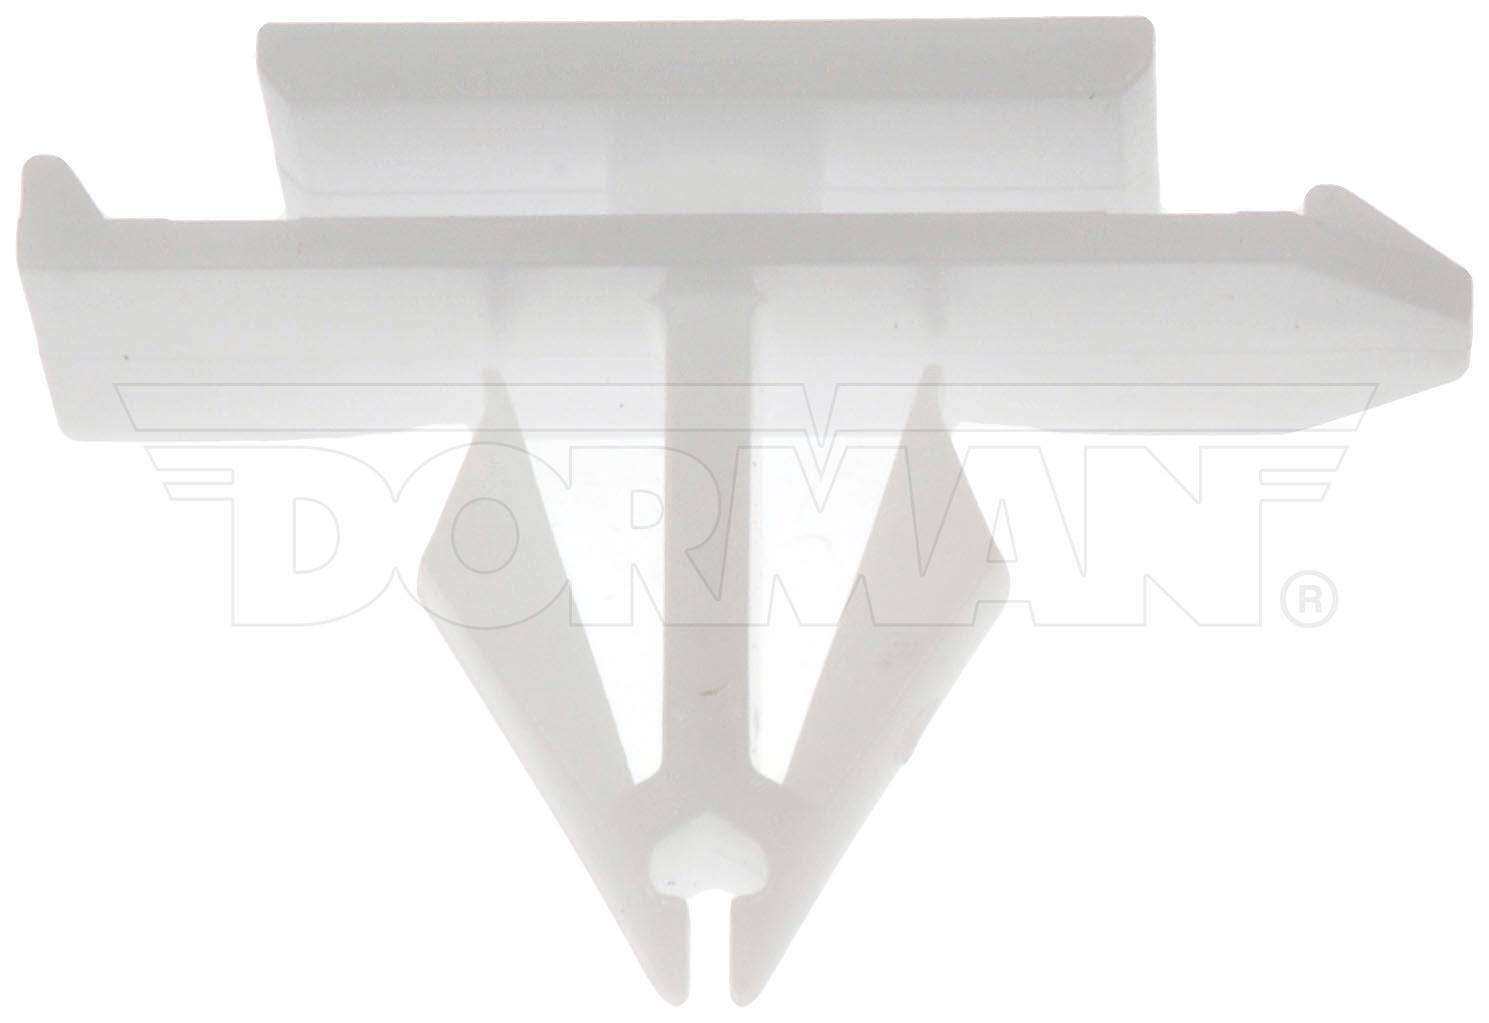 DORMAN - AUTOGRADE - Multi Purpose Retainer - DOC 963-203